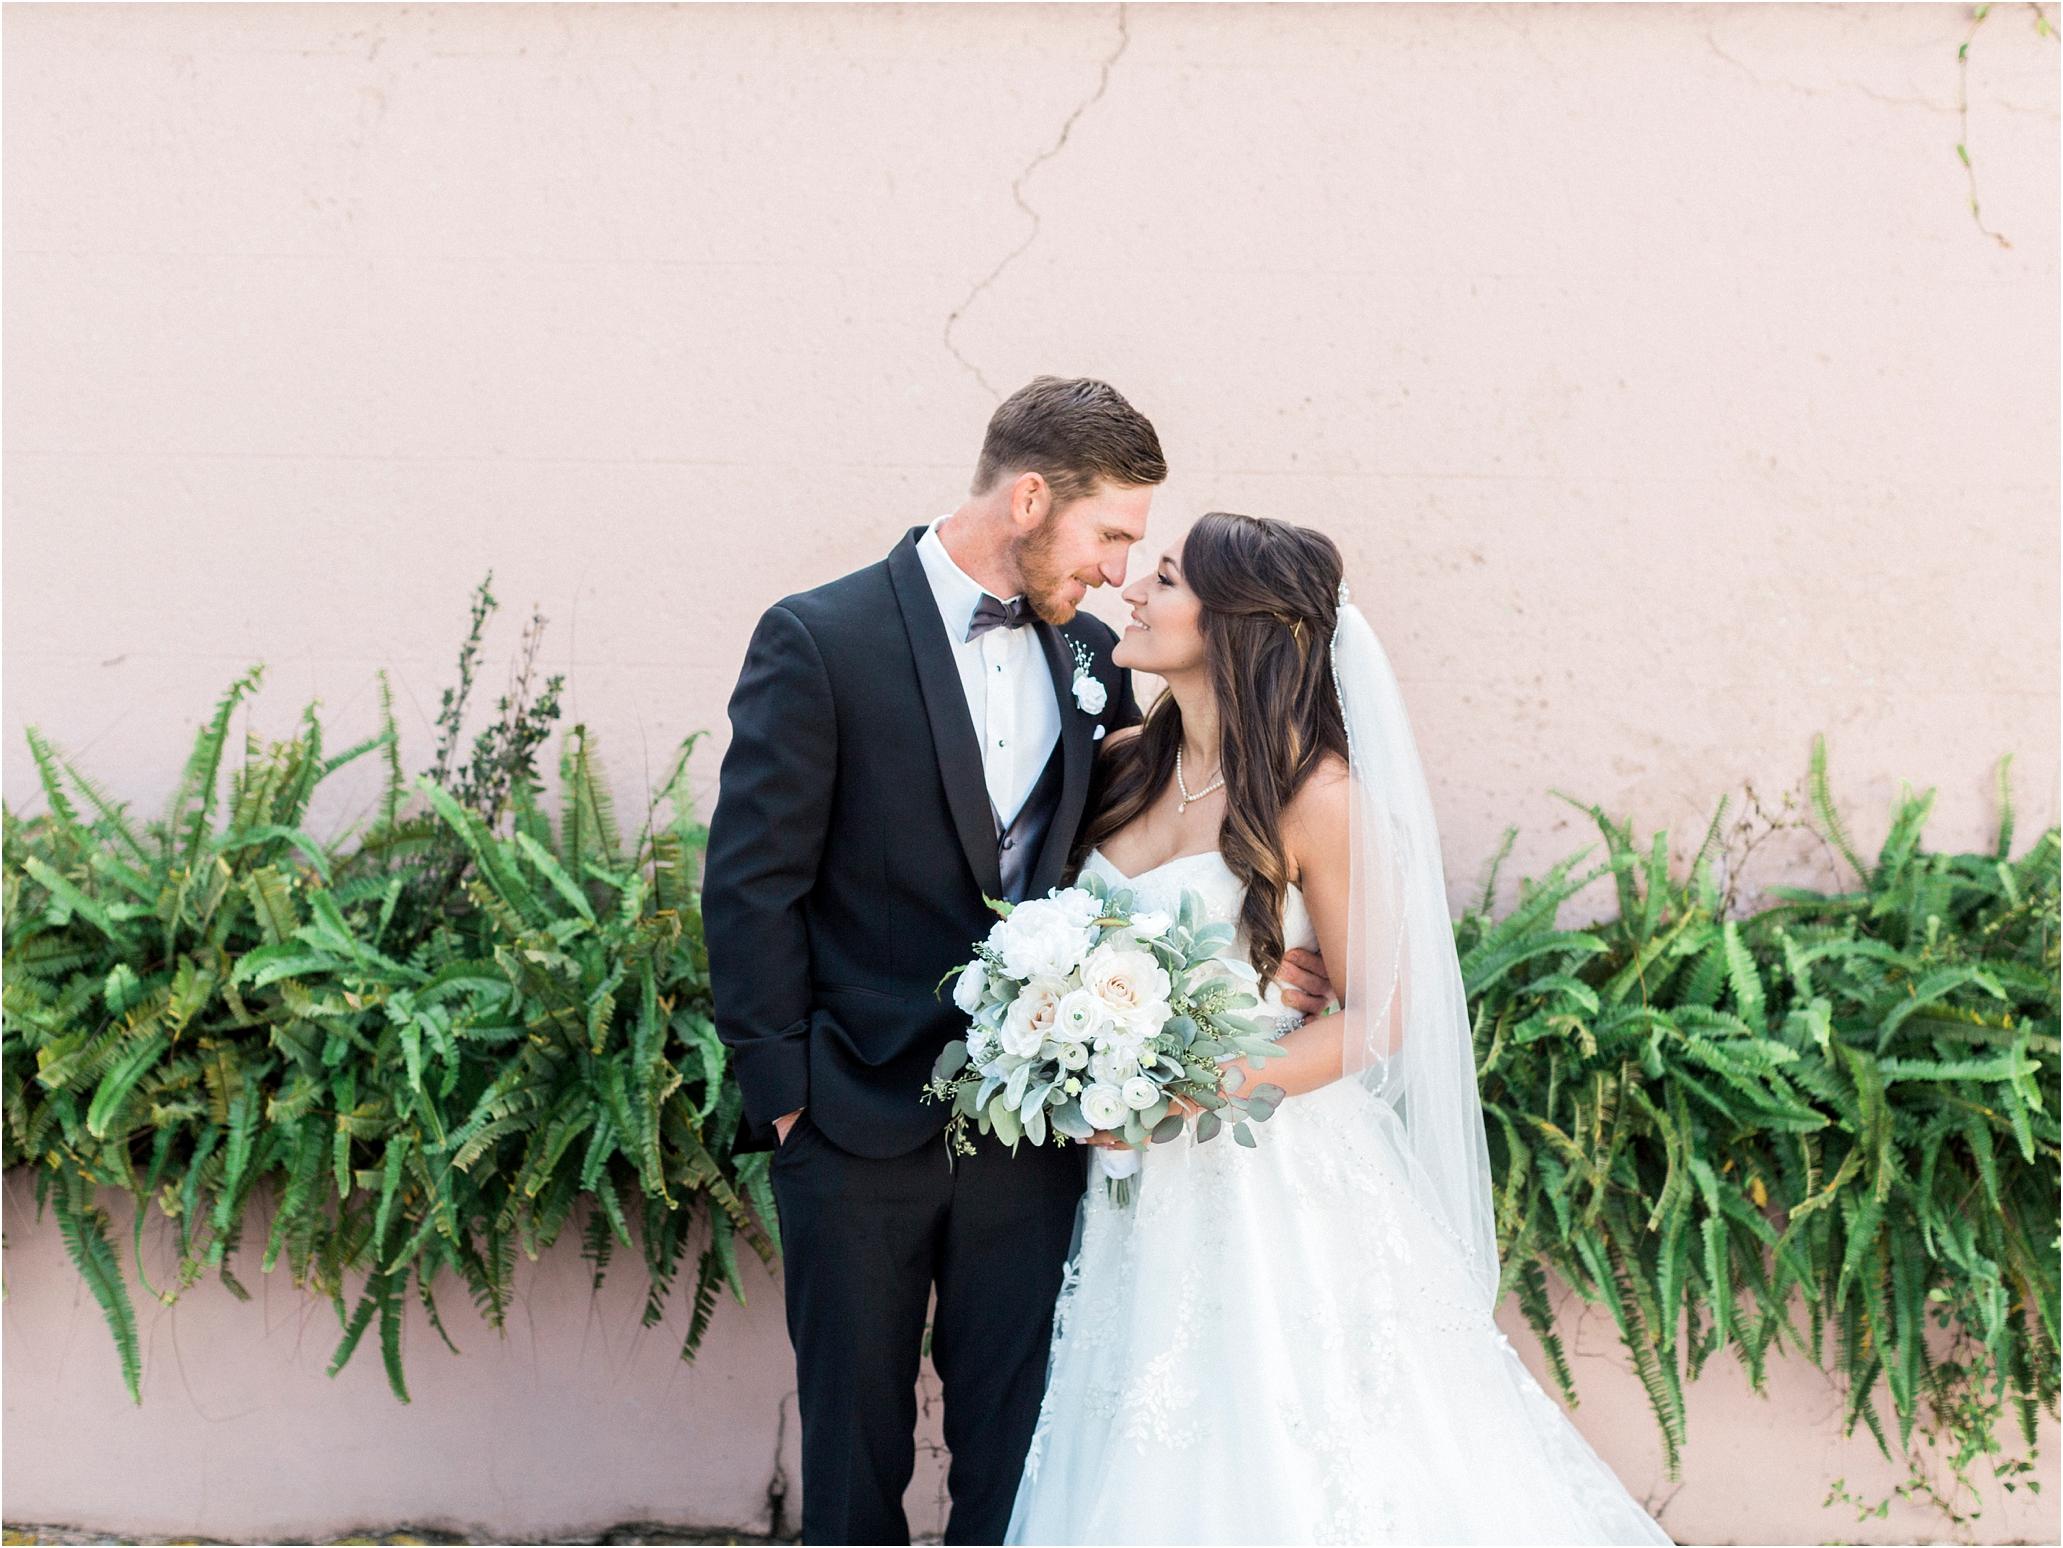 Lisa Silva Photography- Ponte Vedra Beach and Jacksonville, Florida Fine Art Film Wedding Photography- Wedding at The White Room Villa Blanca in St. Augustine, Florida_0035.jpg